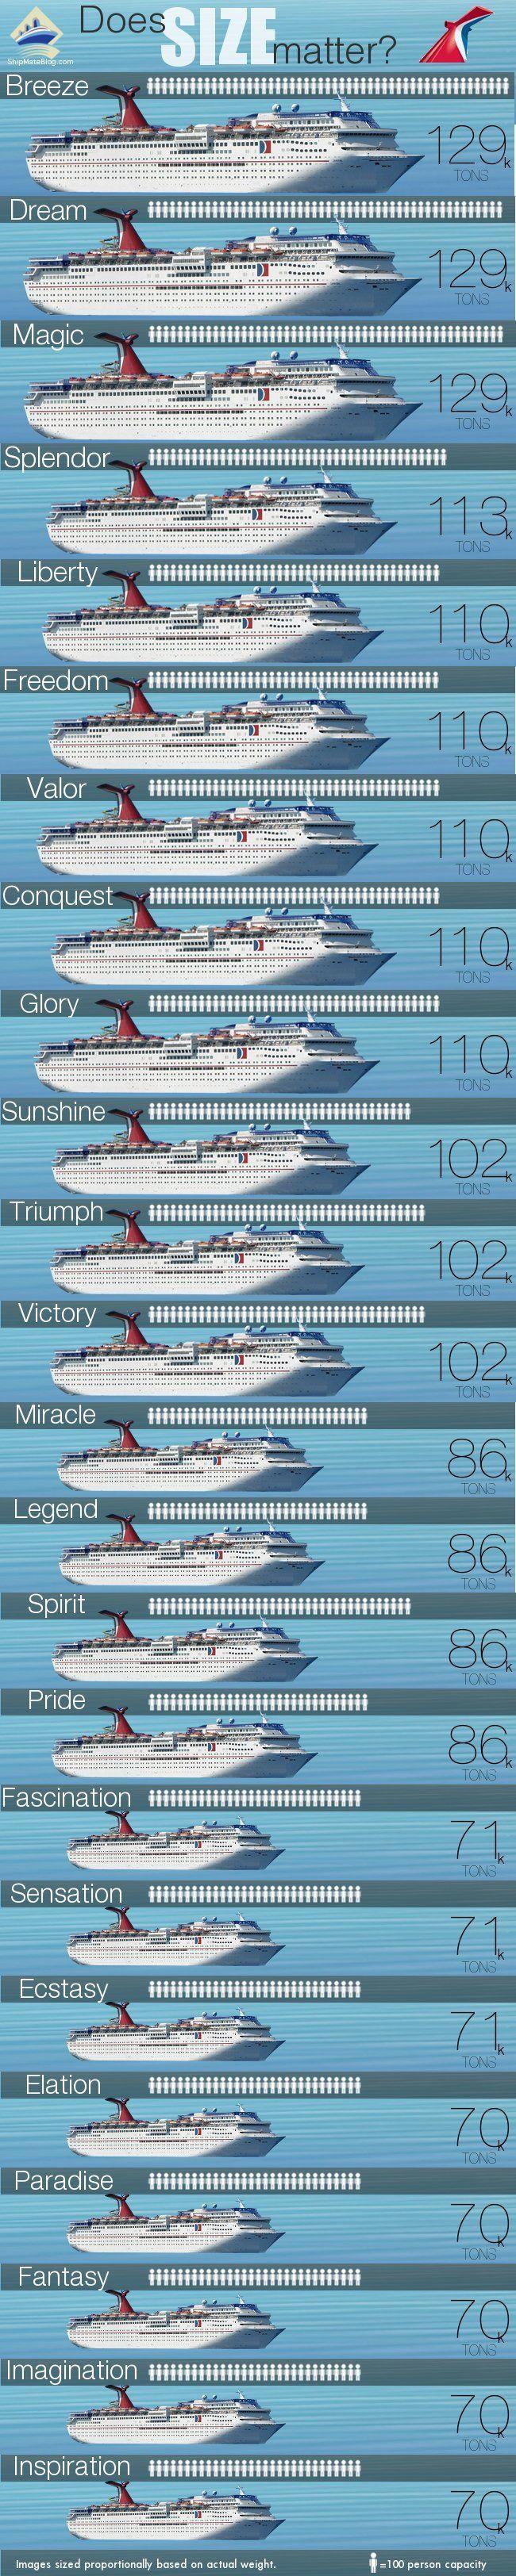 Carnival Cruise Ships Size Comparison   Obsession